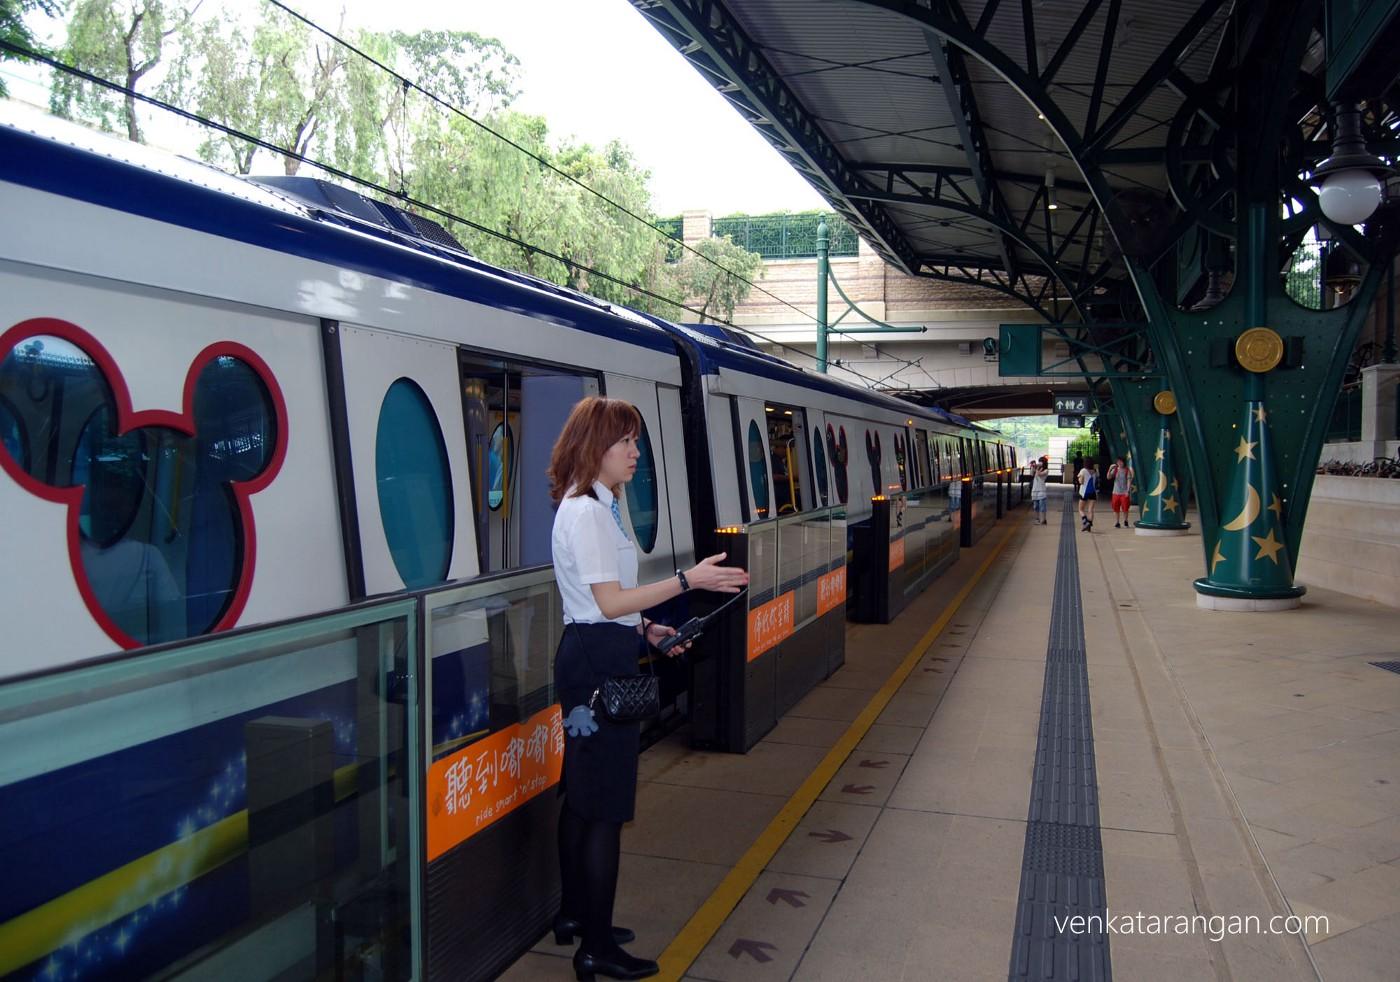 Trains (Hong Kong MTR) too had Mickey branding